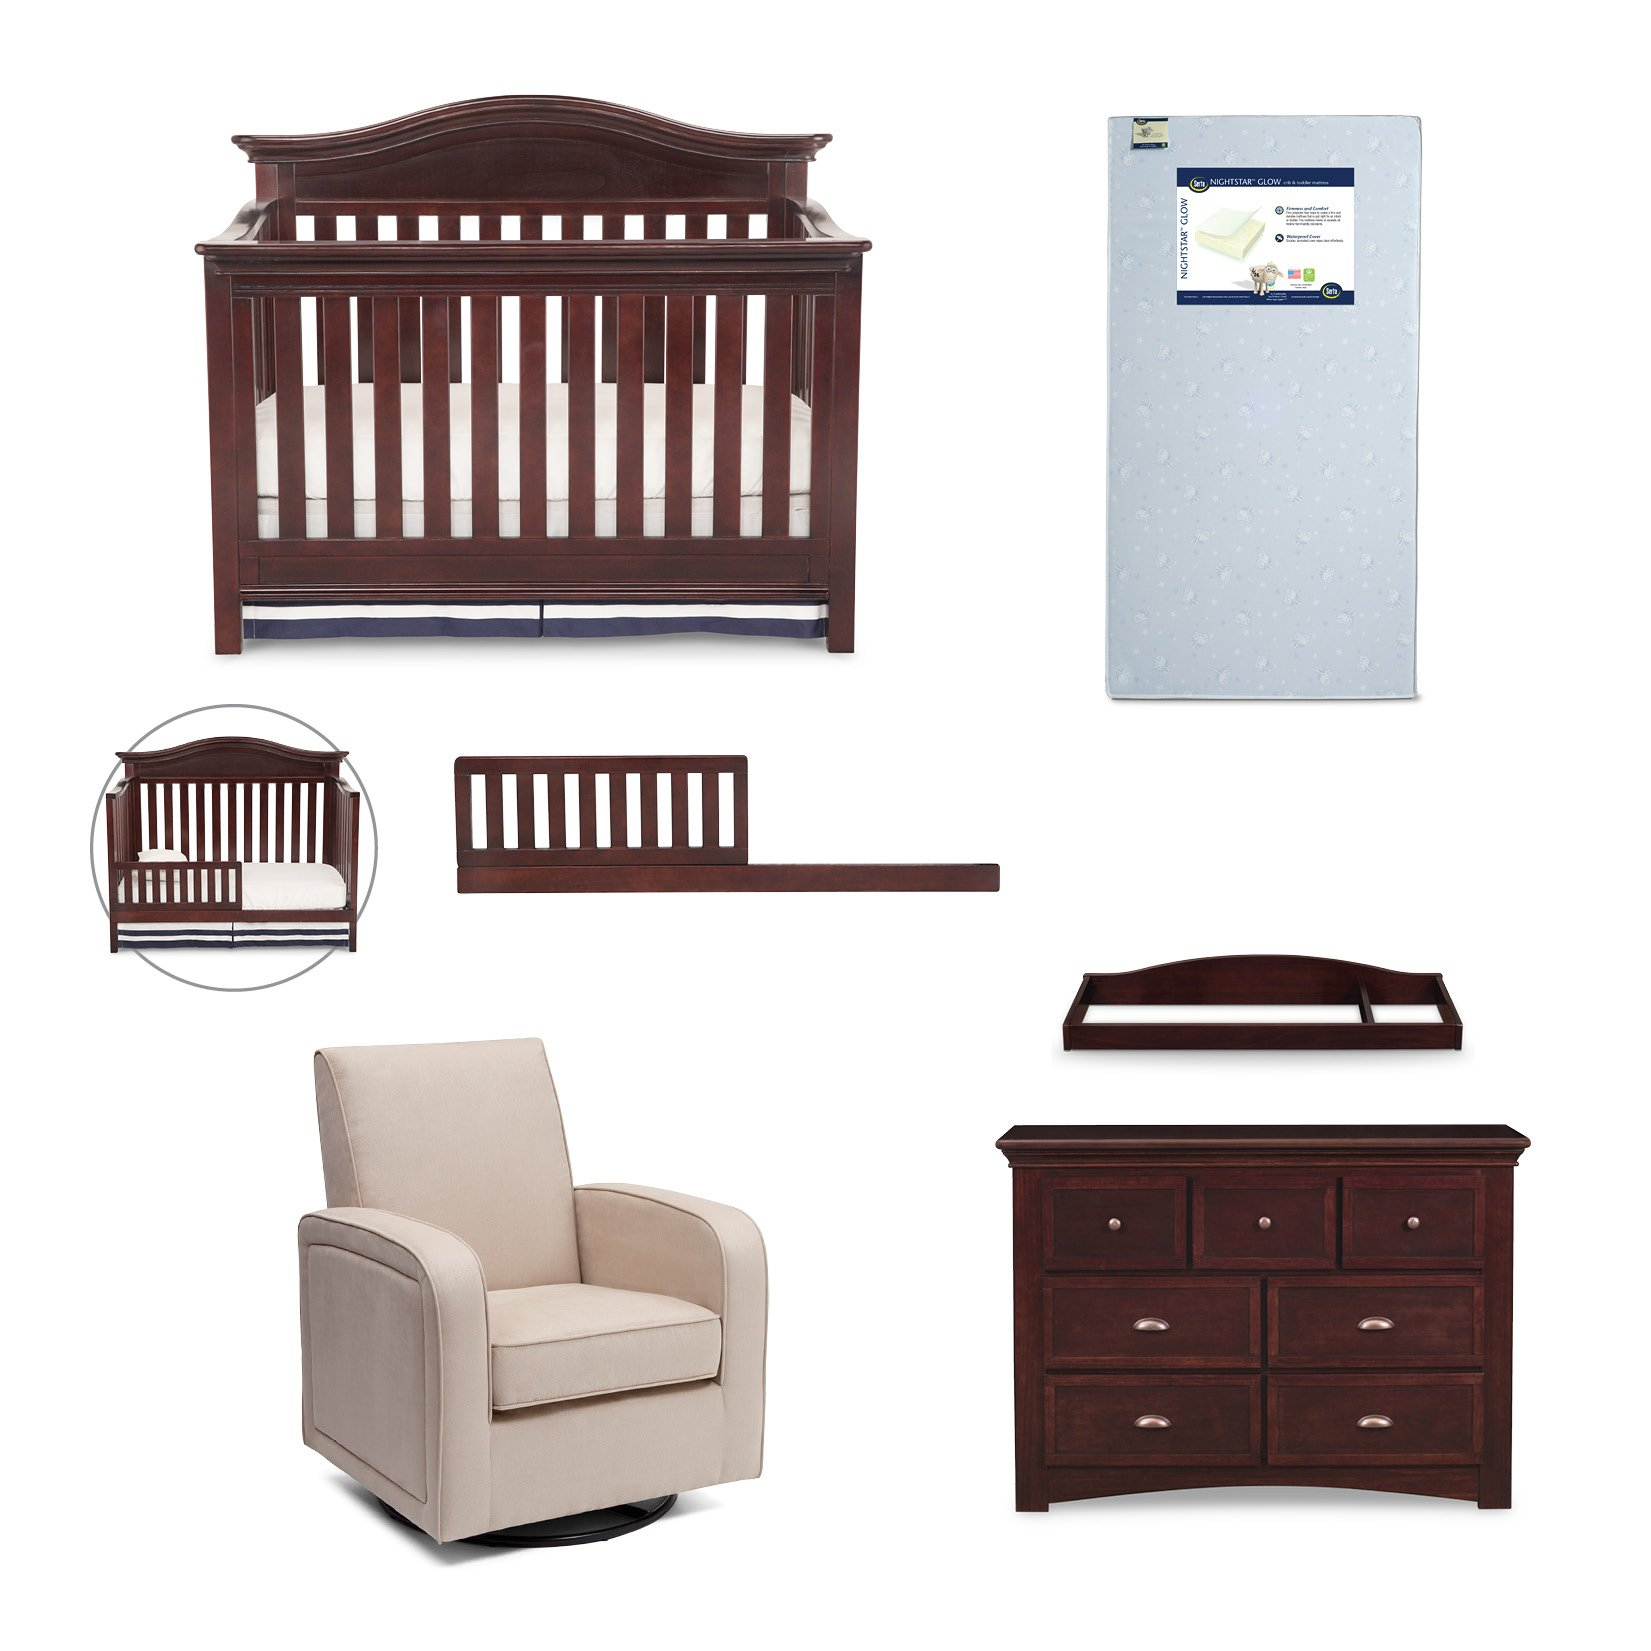 Simmons Kids Augusta 6-Piece Molasses Brown Nursery Furniture Set: Convertible Crib | Daybed/Toddler Guardrail | Dresser | Changing Top | Crib Mattress |Glider